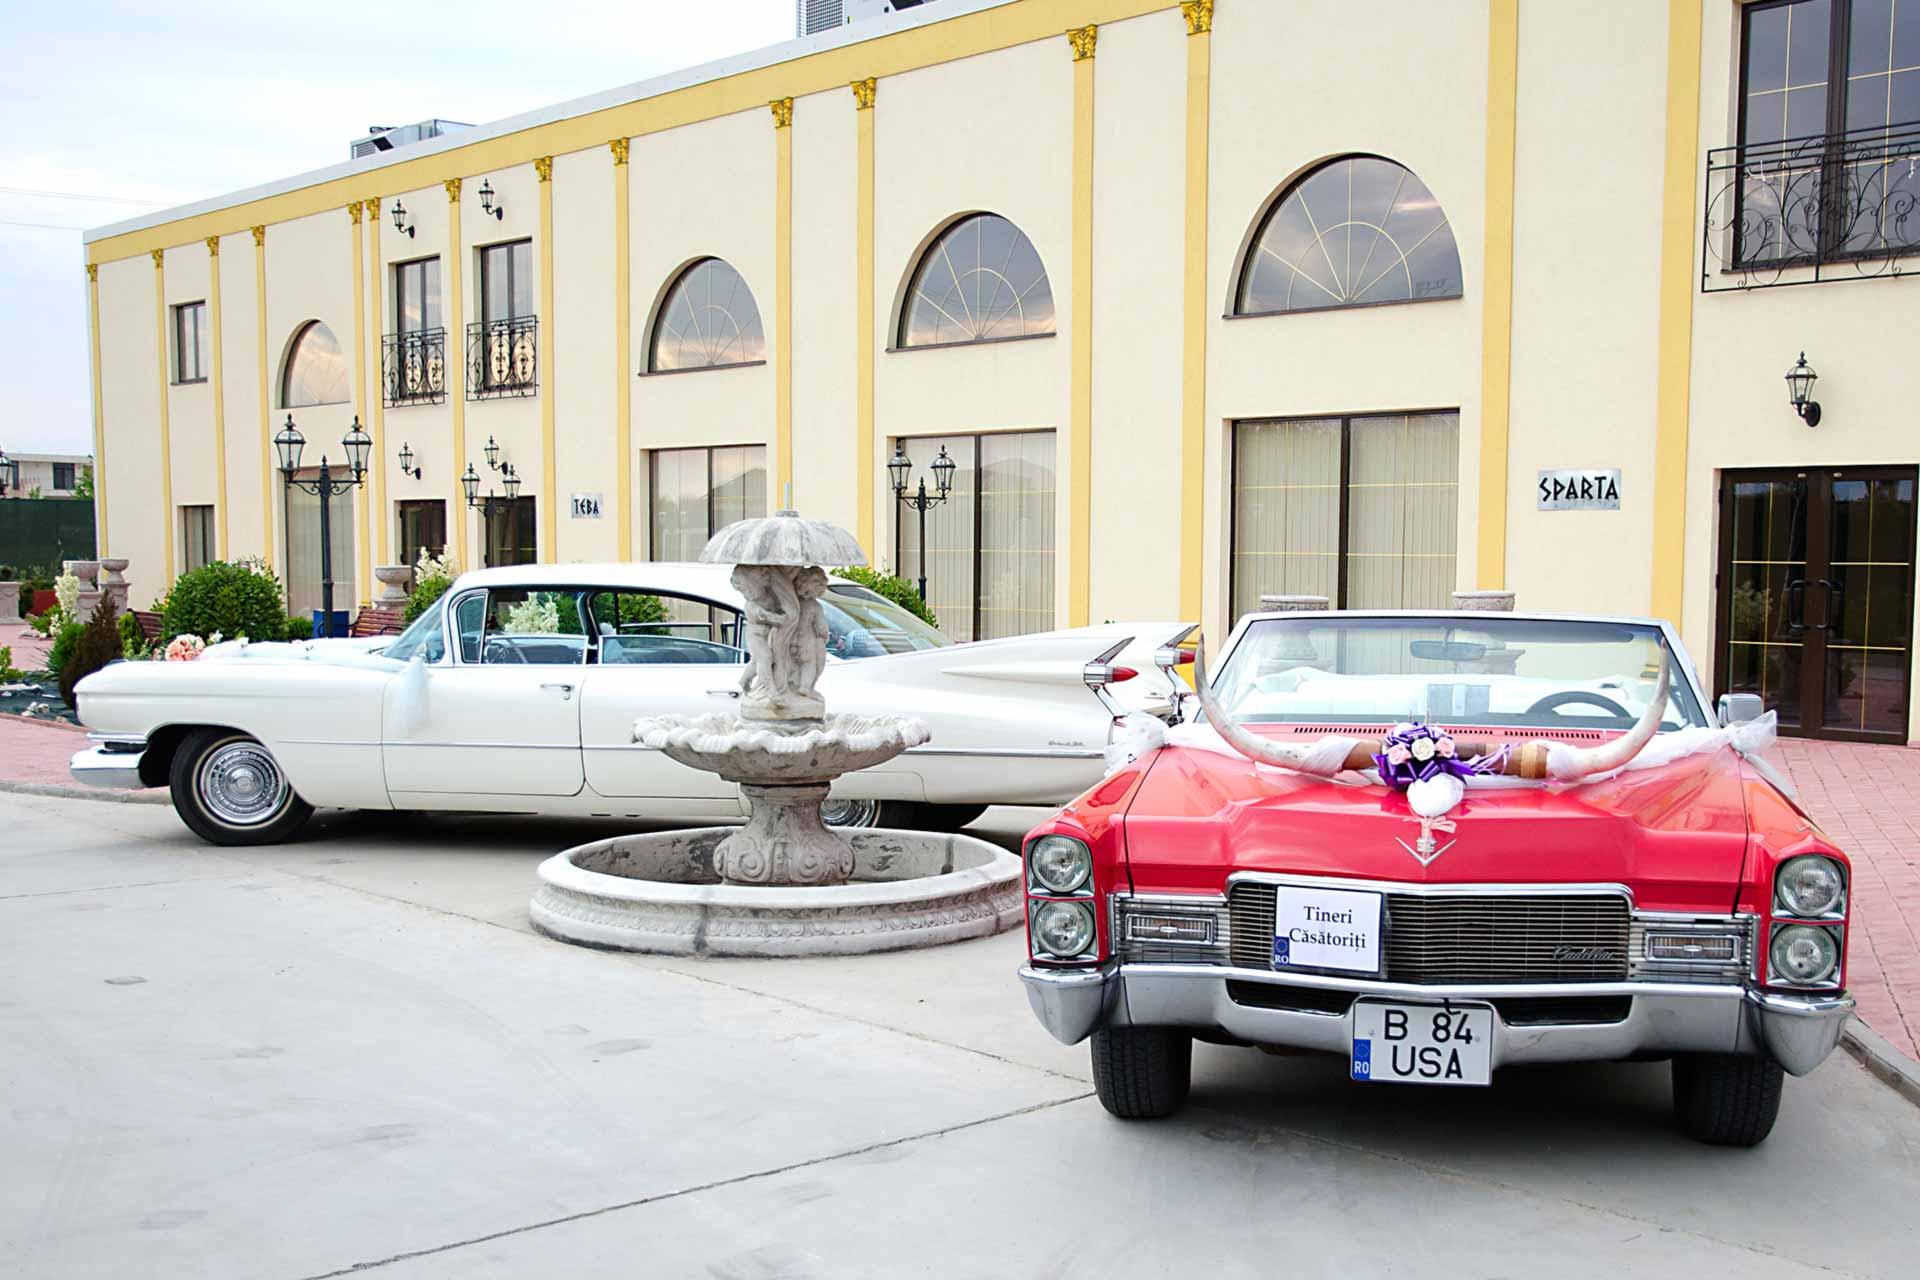 Masina de epoca Cadillac de inchiriat pentru nunti